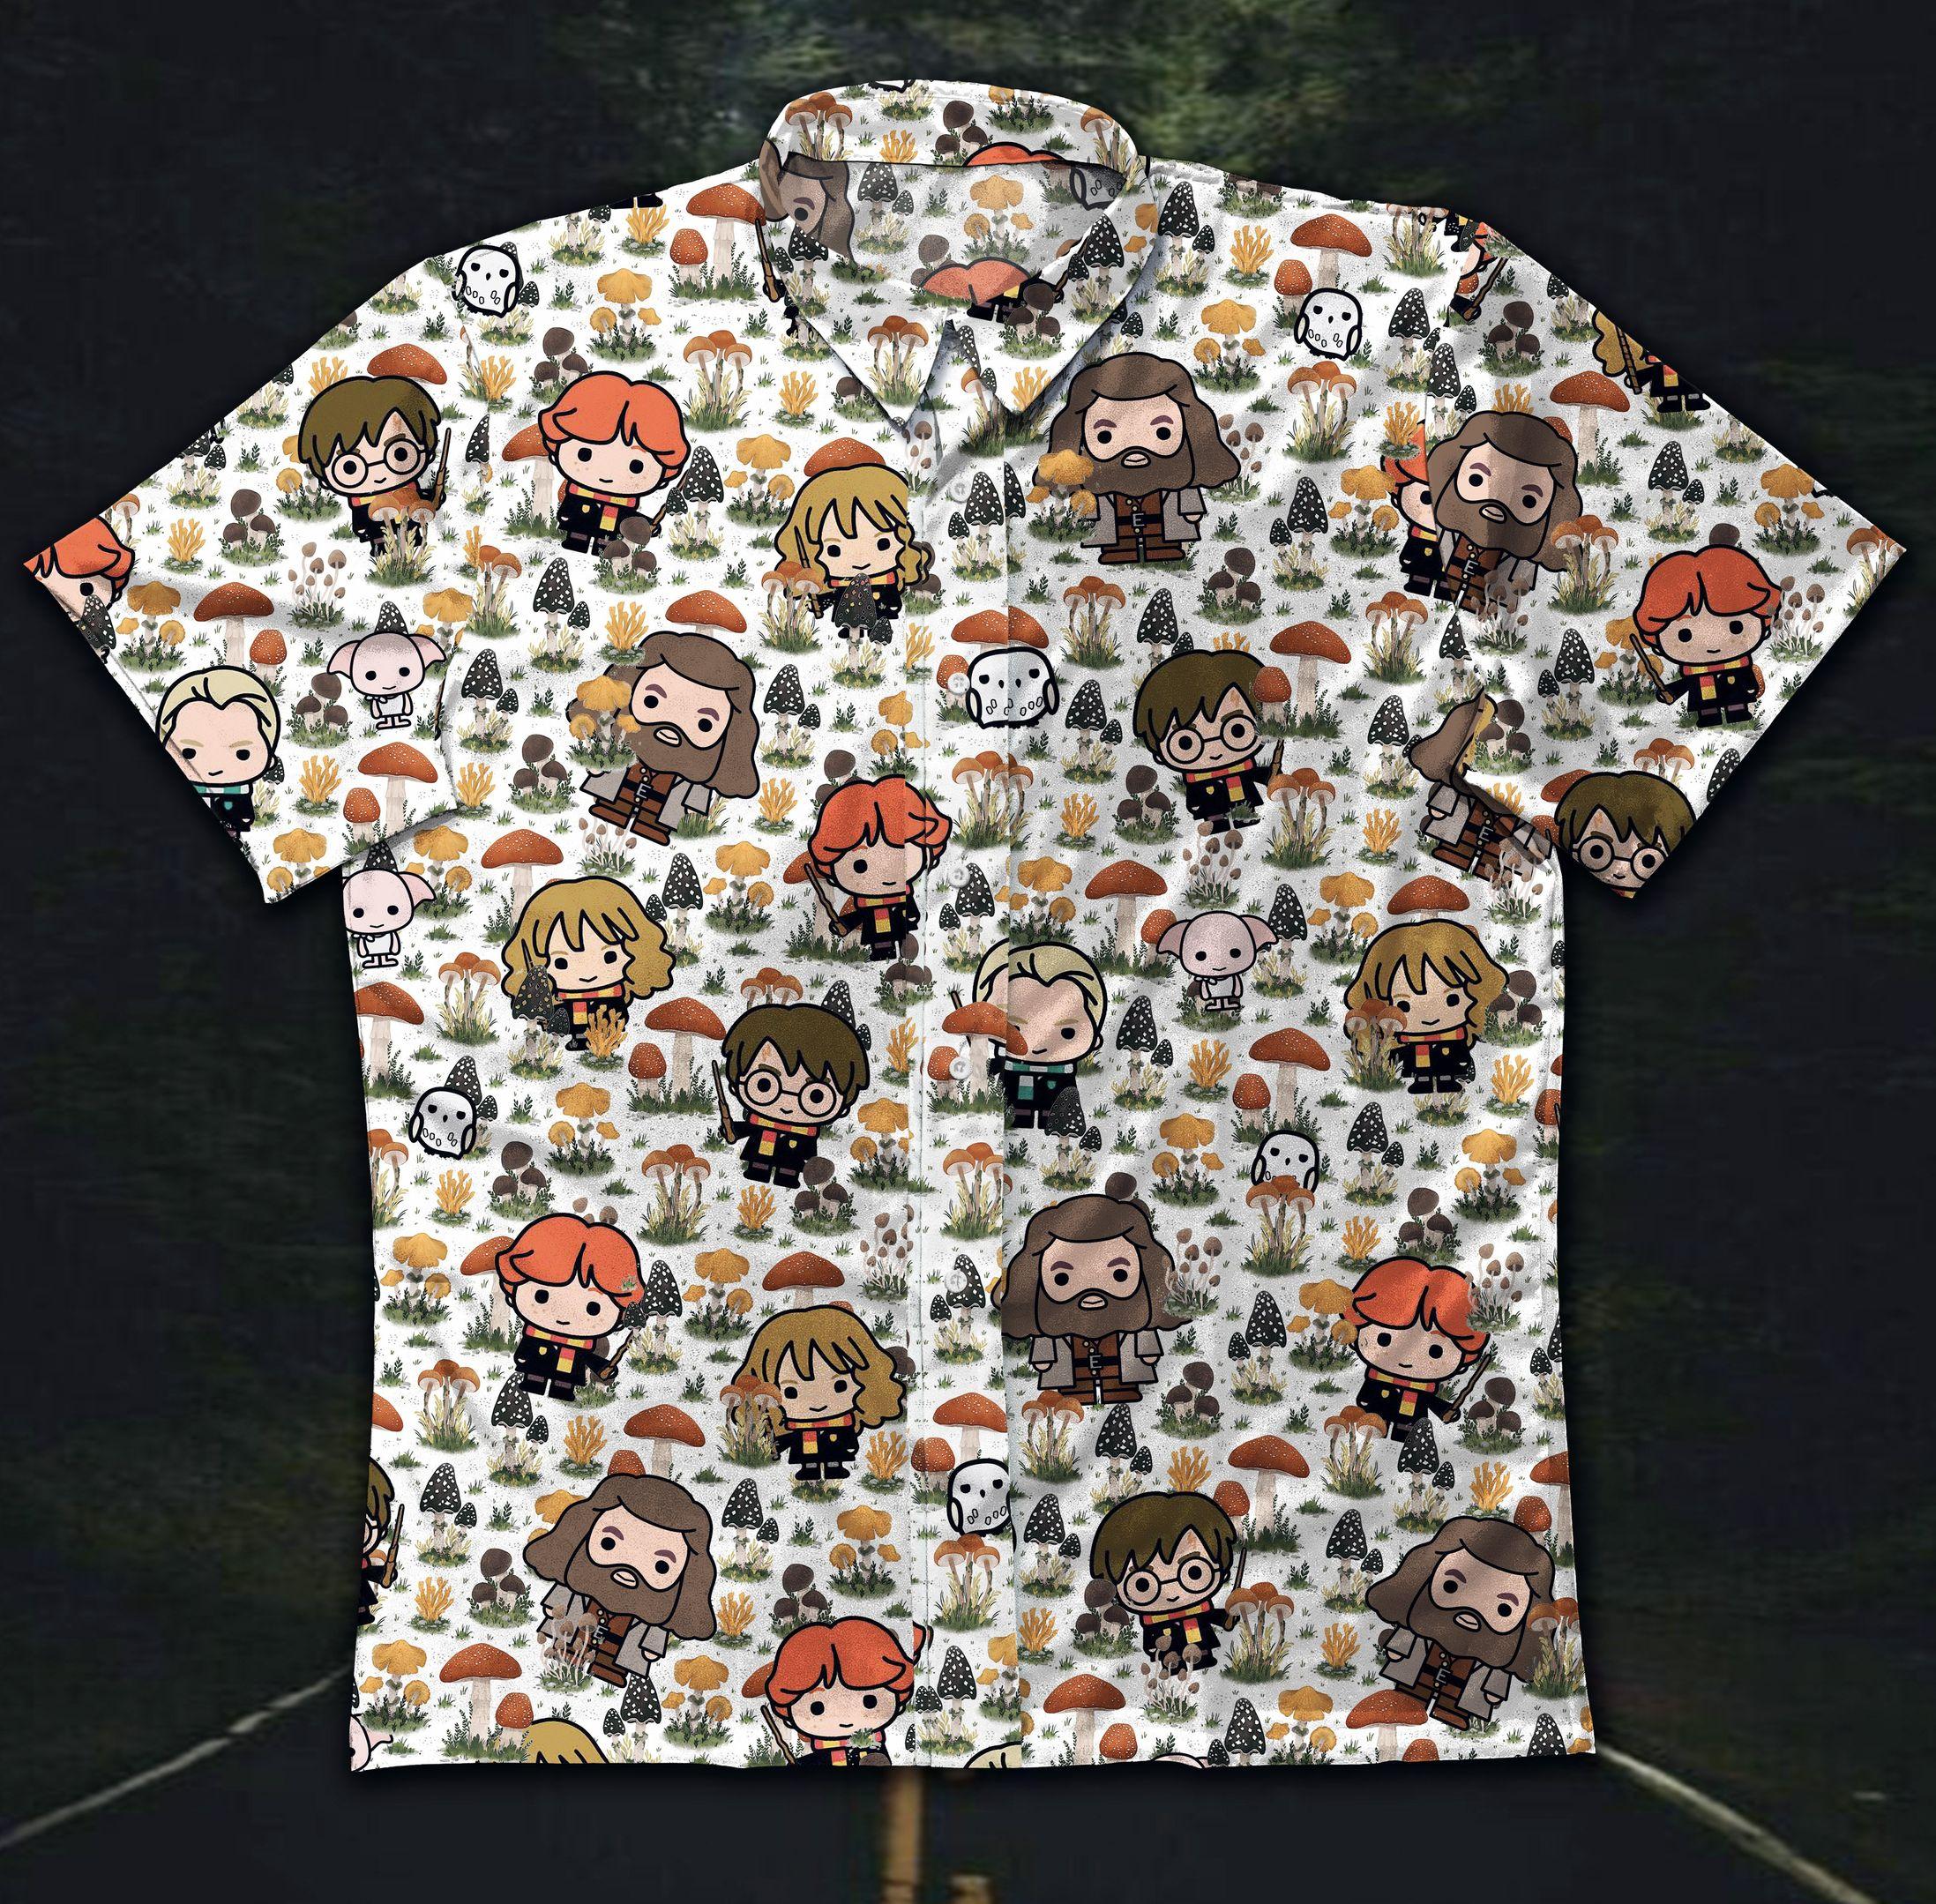 Harry Potter Chibi style Hawaiian Shirt Button Up Shirt